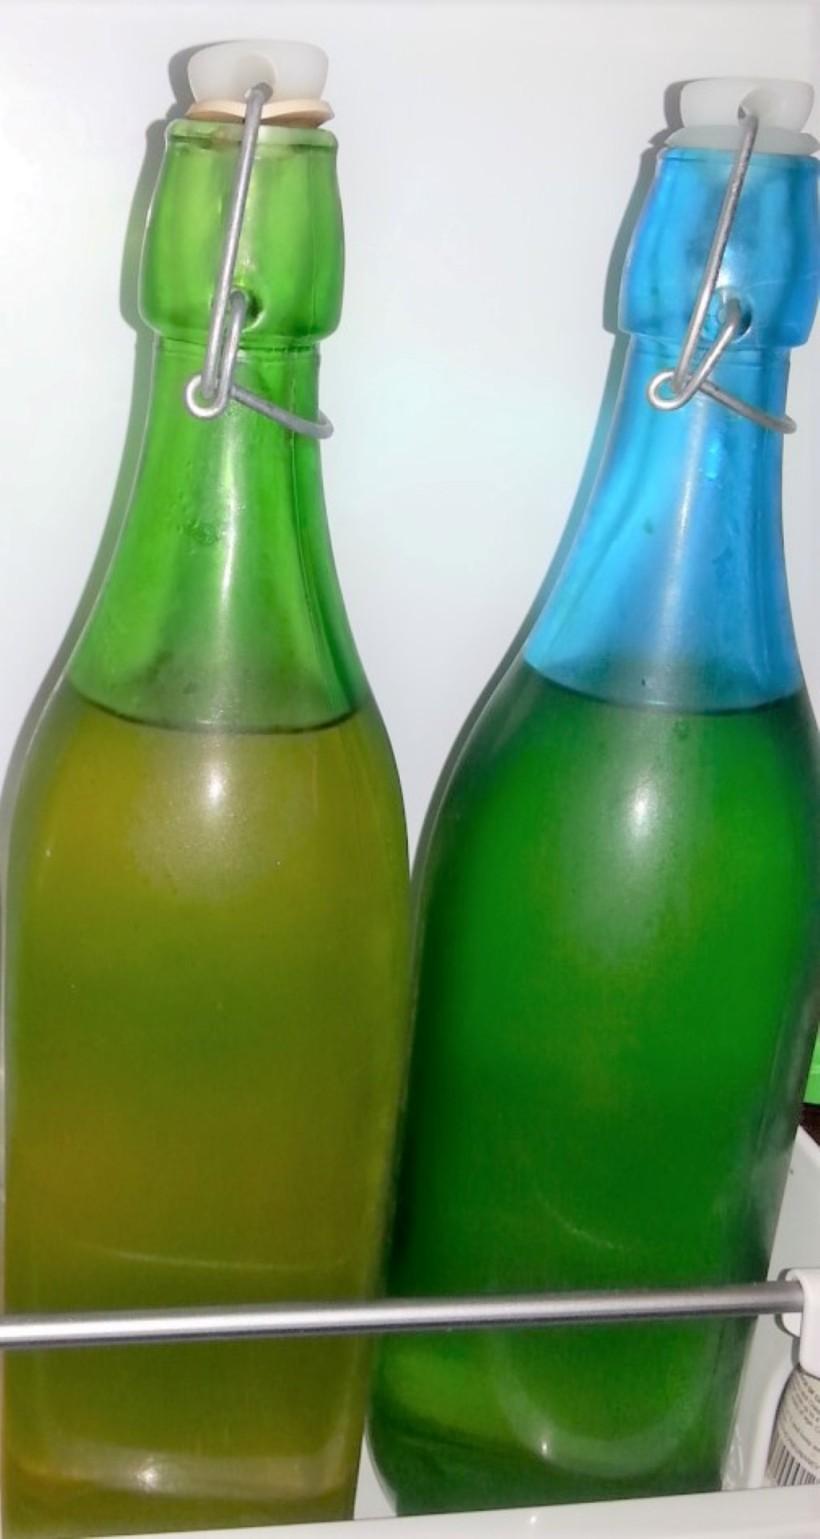 Alternative to Alcoholic beverages